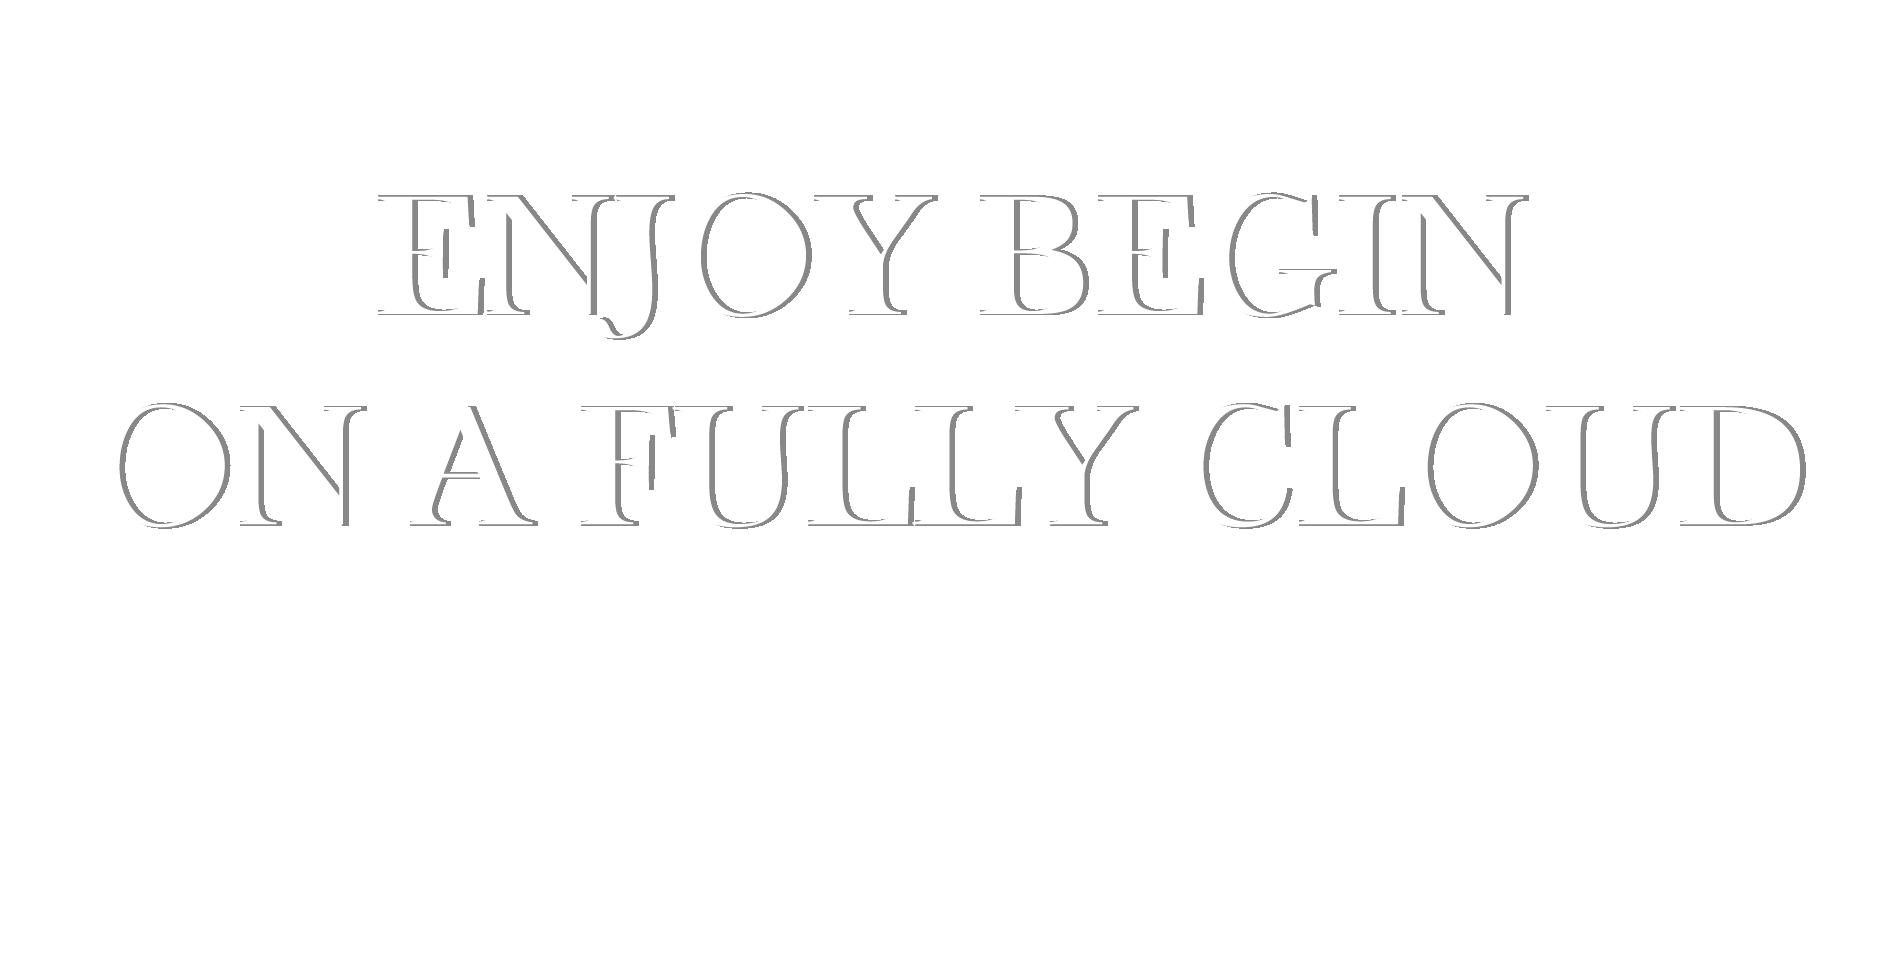 EnjoyFullyCloud